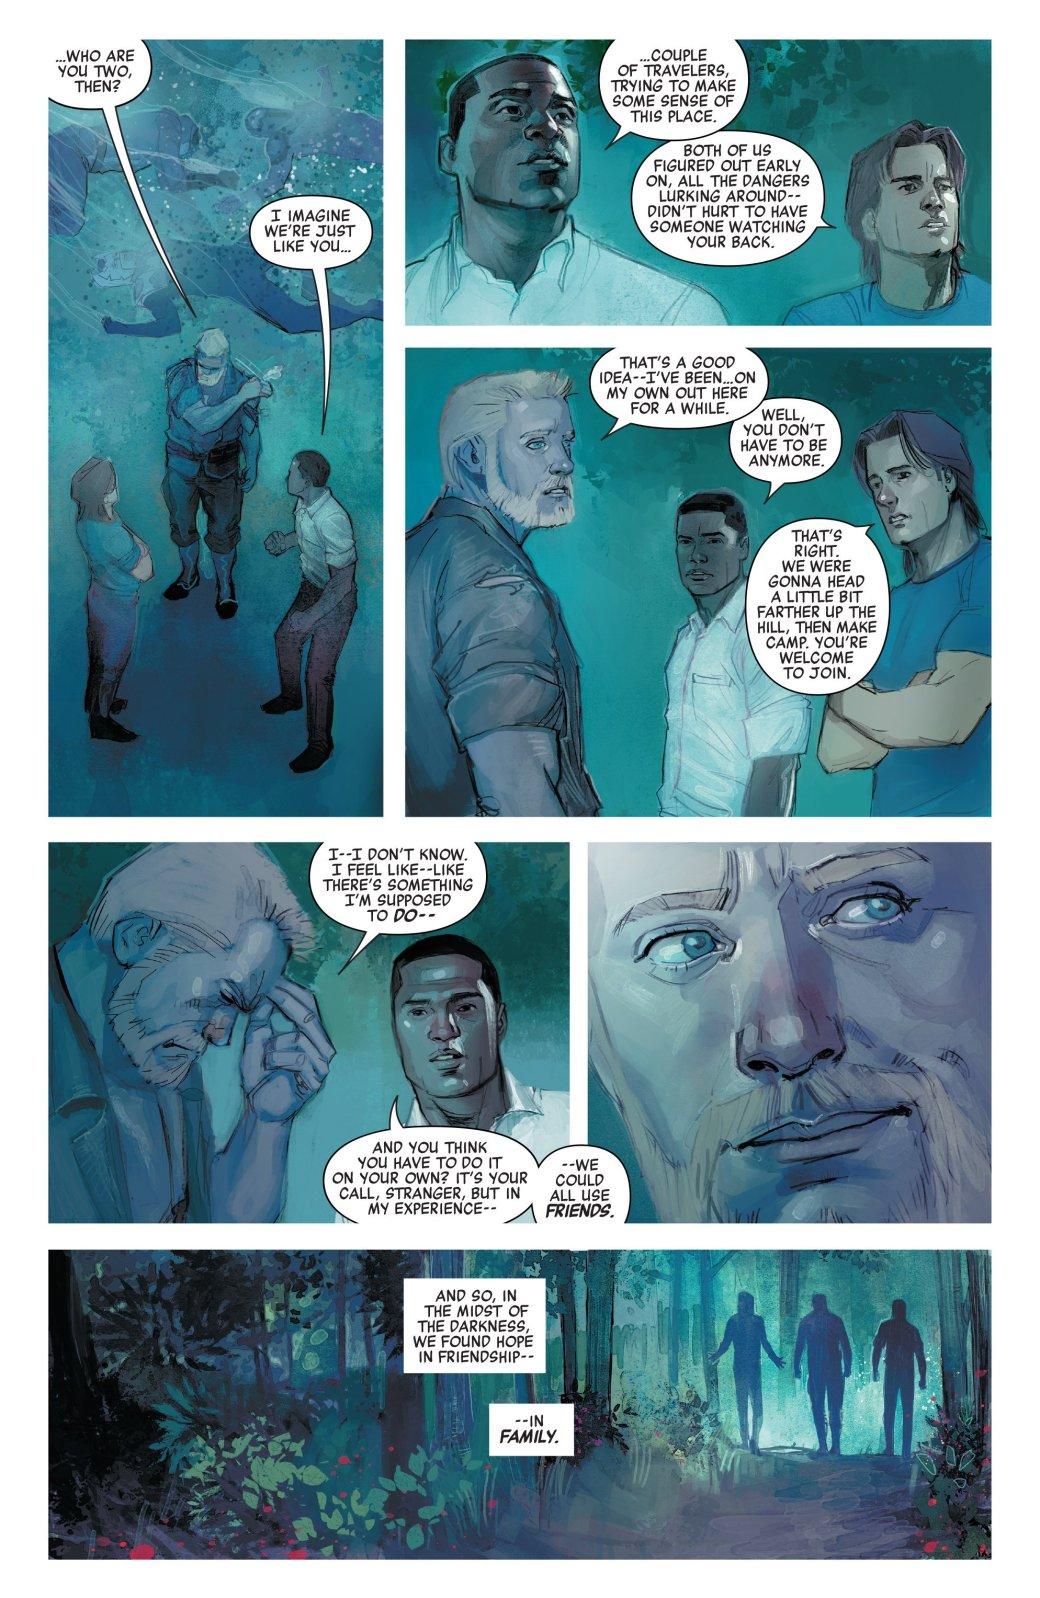 Secret Empire: противостоянию Стива Роджерса иТони Старка нет конца - Изображение 28